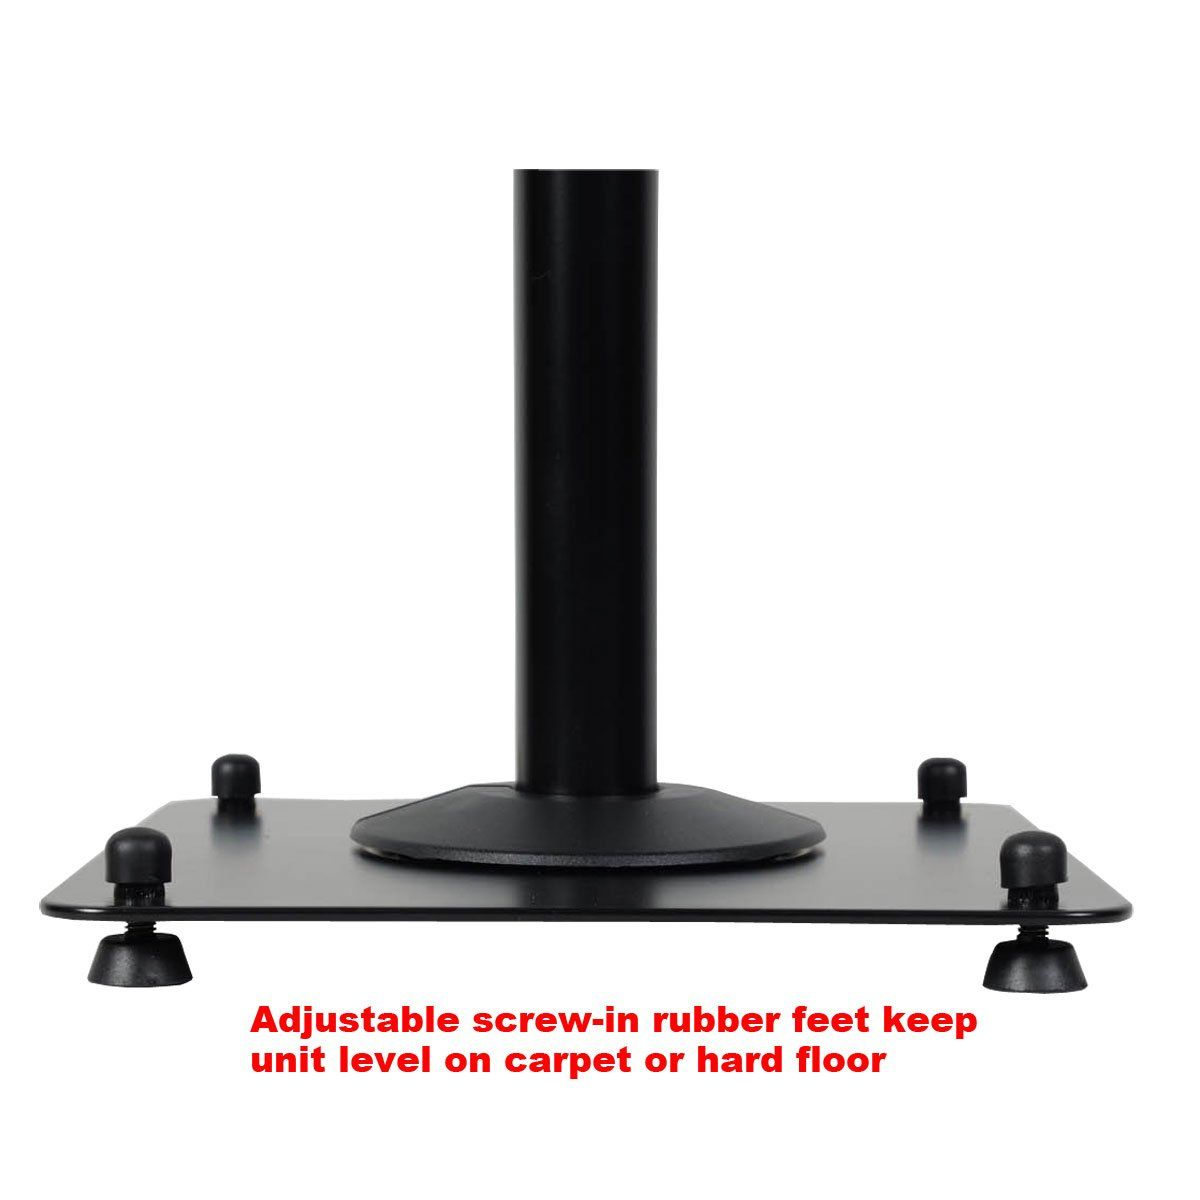 VideoSecu 2 Heavy duty PA DJ Club Adjustable Height Satellite Speaker Stand to